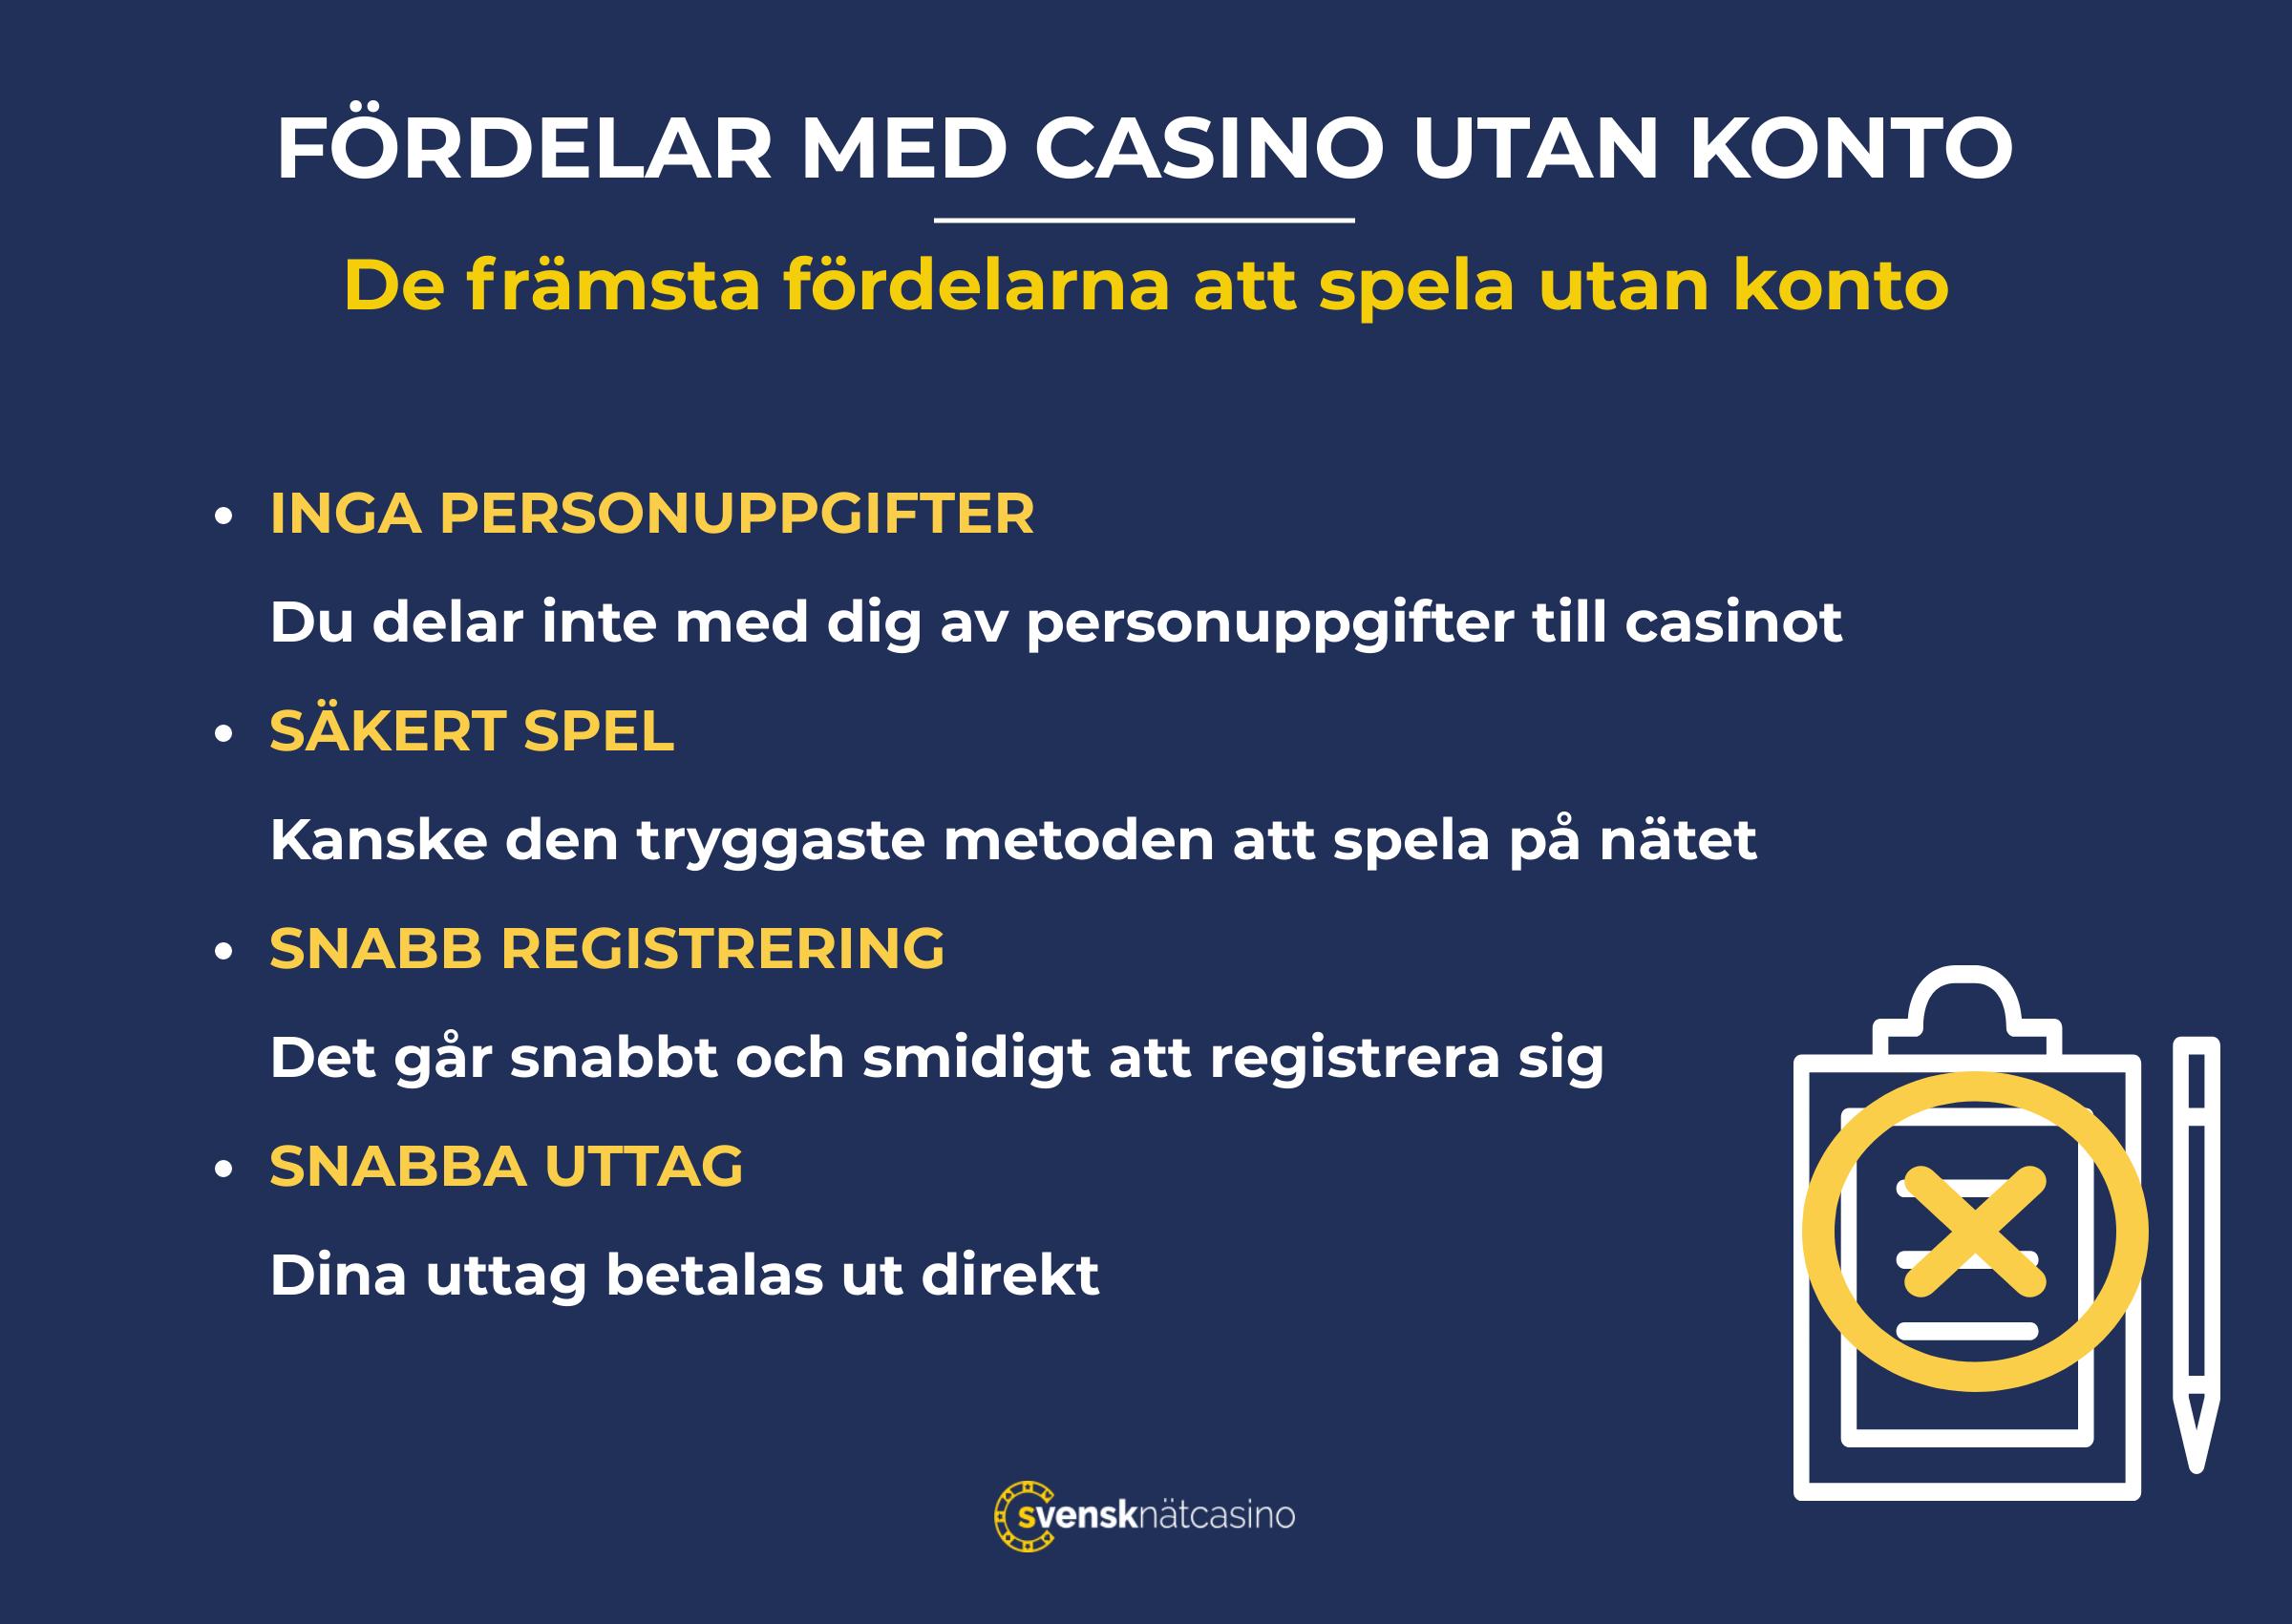 casino utan konto infographic useful svensknatcasino